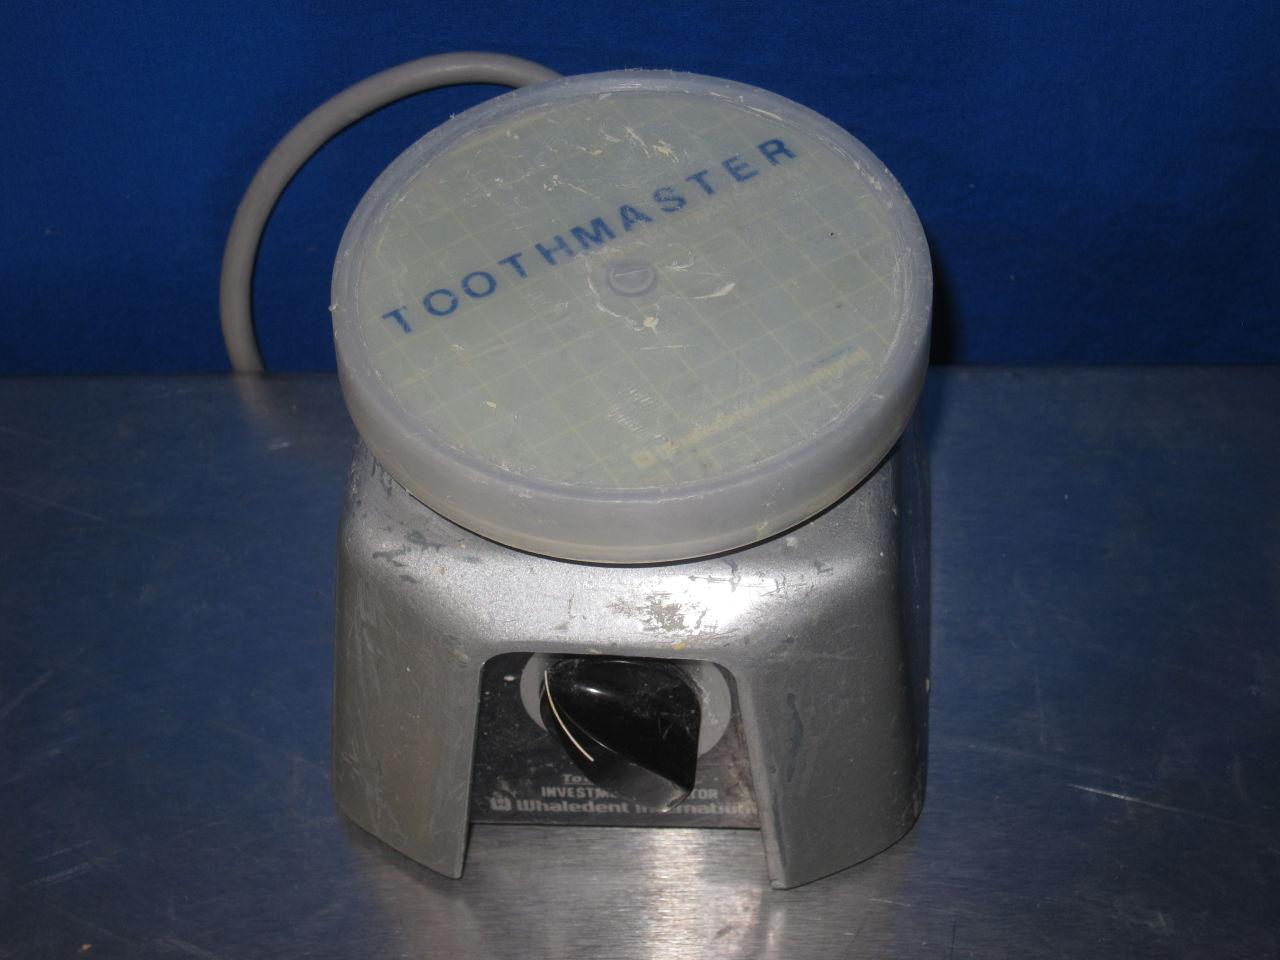 WHALEDENT INTERNATIONAL Toothmaster Investment Vibrator